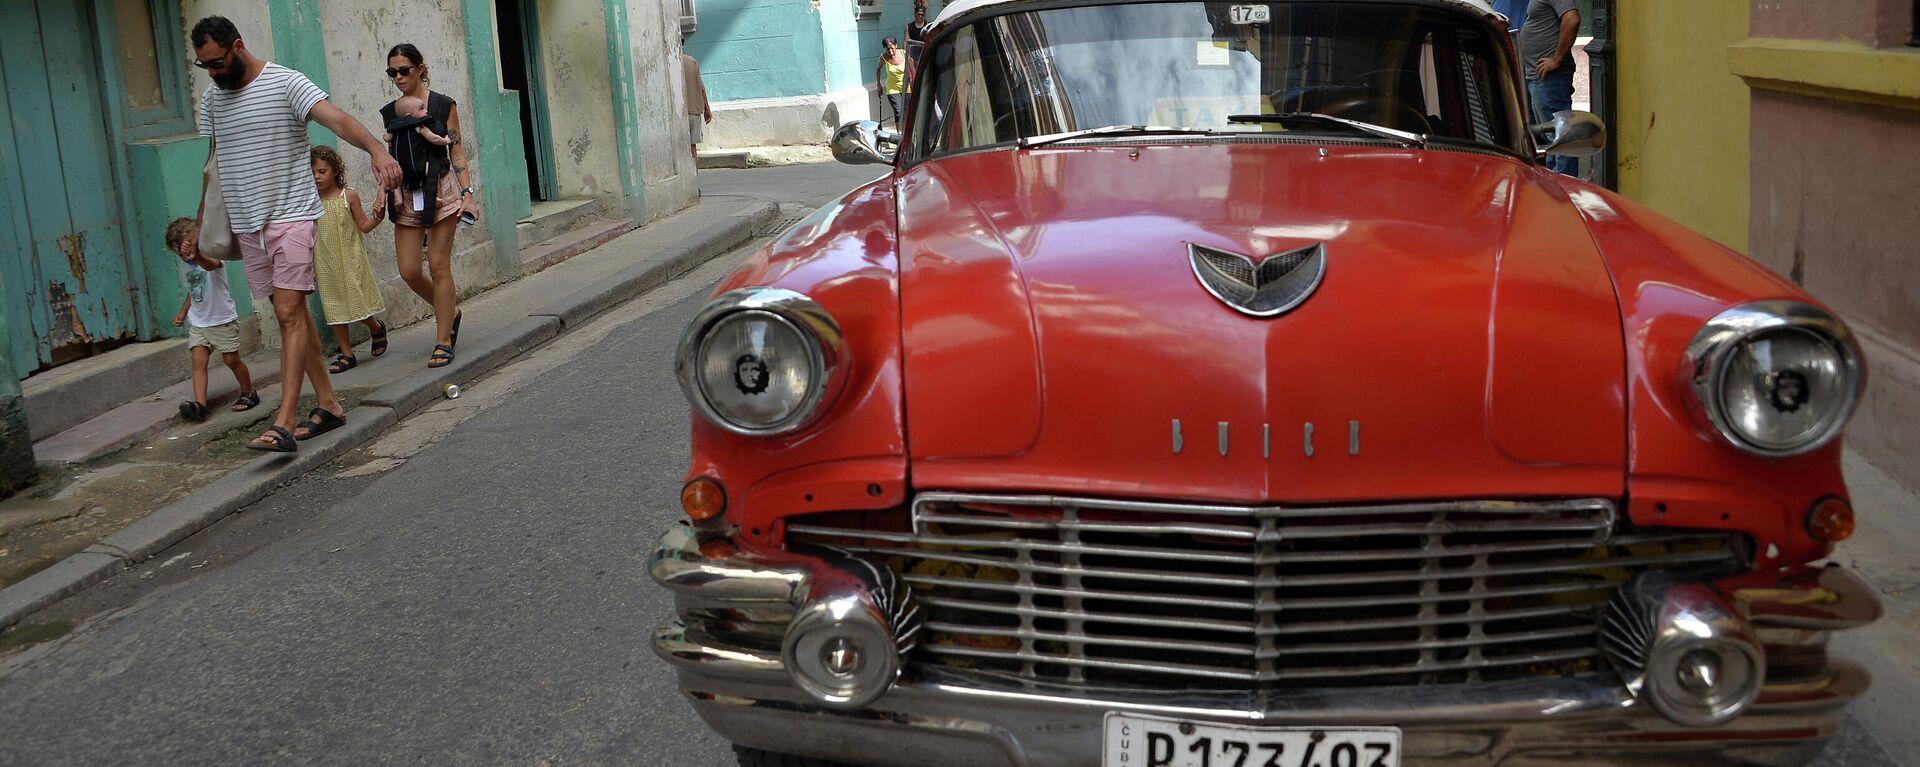 Coche estadounidense en La Habana, Cuba - Sputnik Mundo, 1920, 15.03.2021